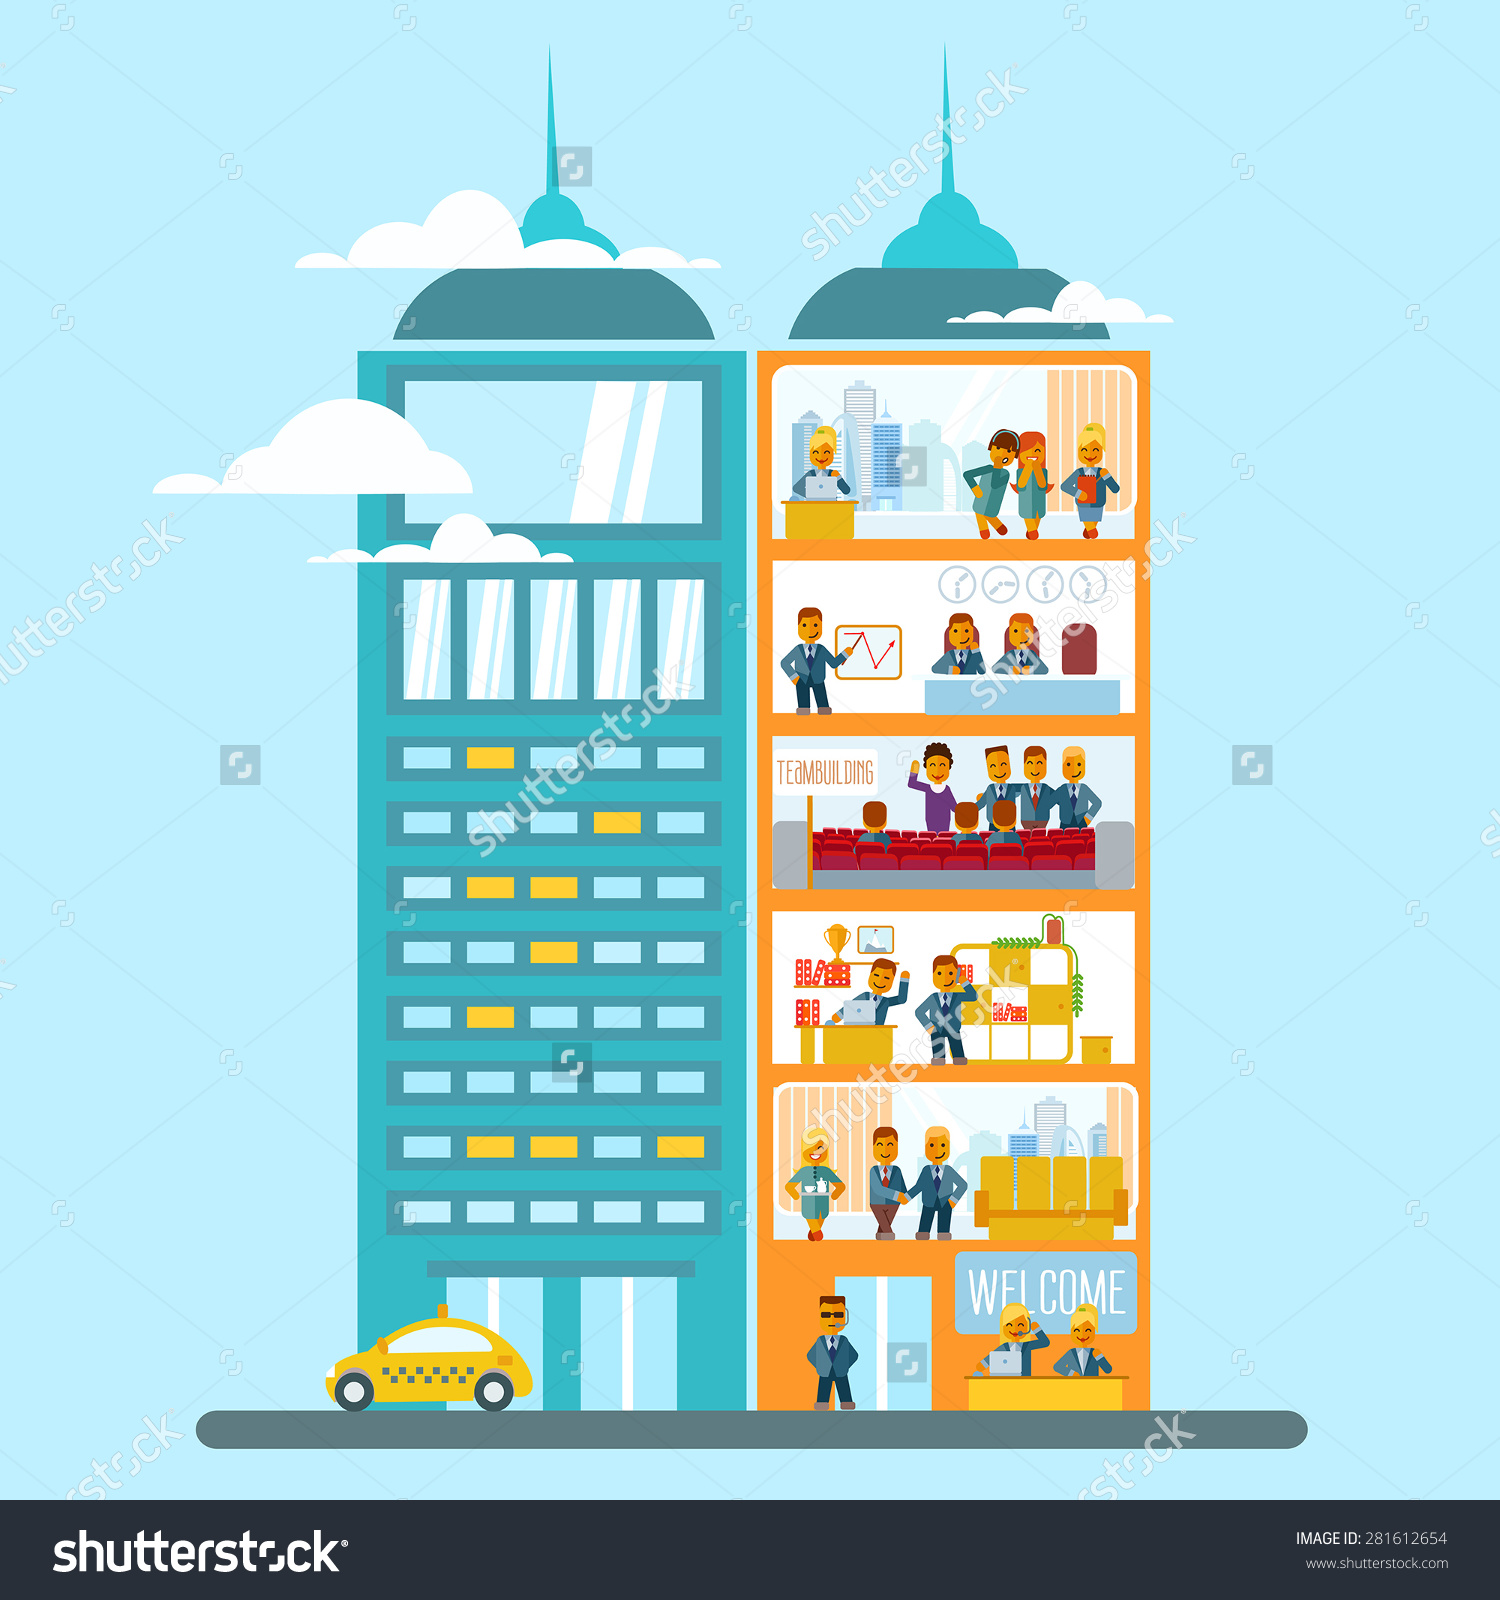 Modern Office Building Cartoon Flat Style Stock Vector 281612654.